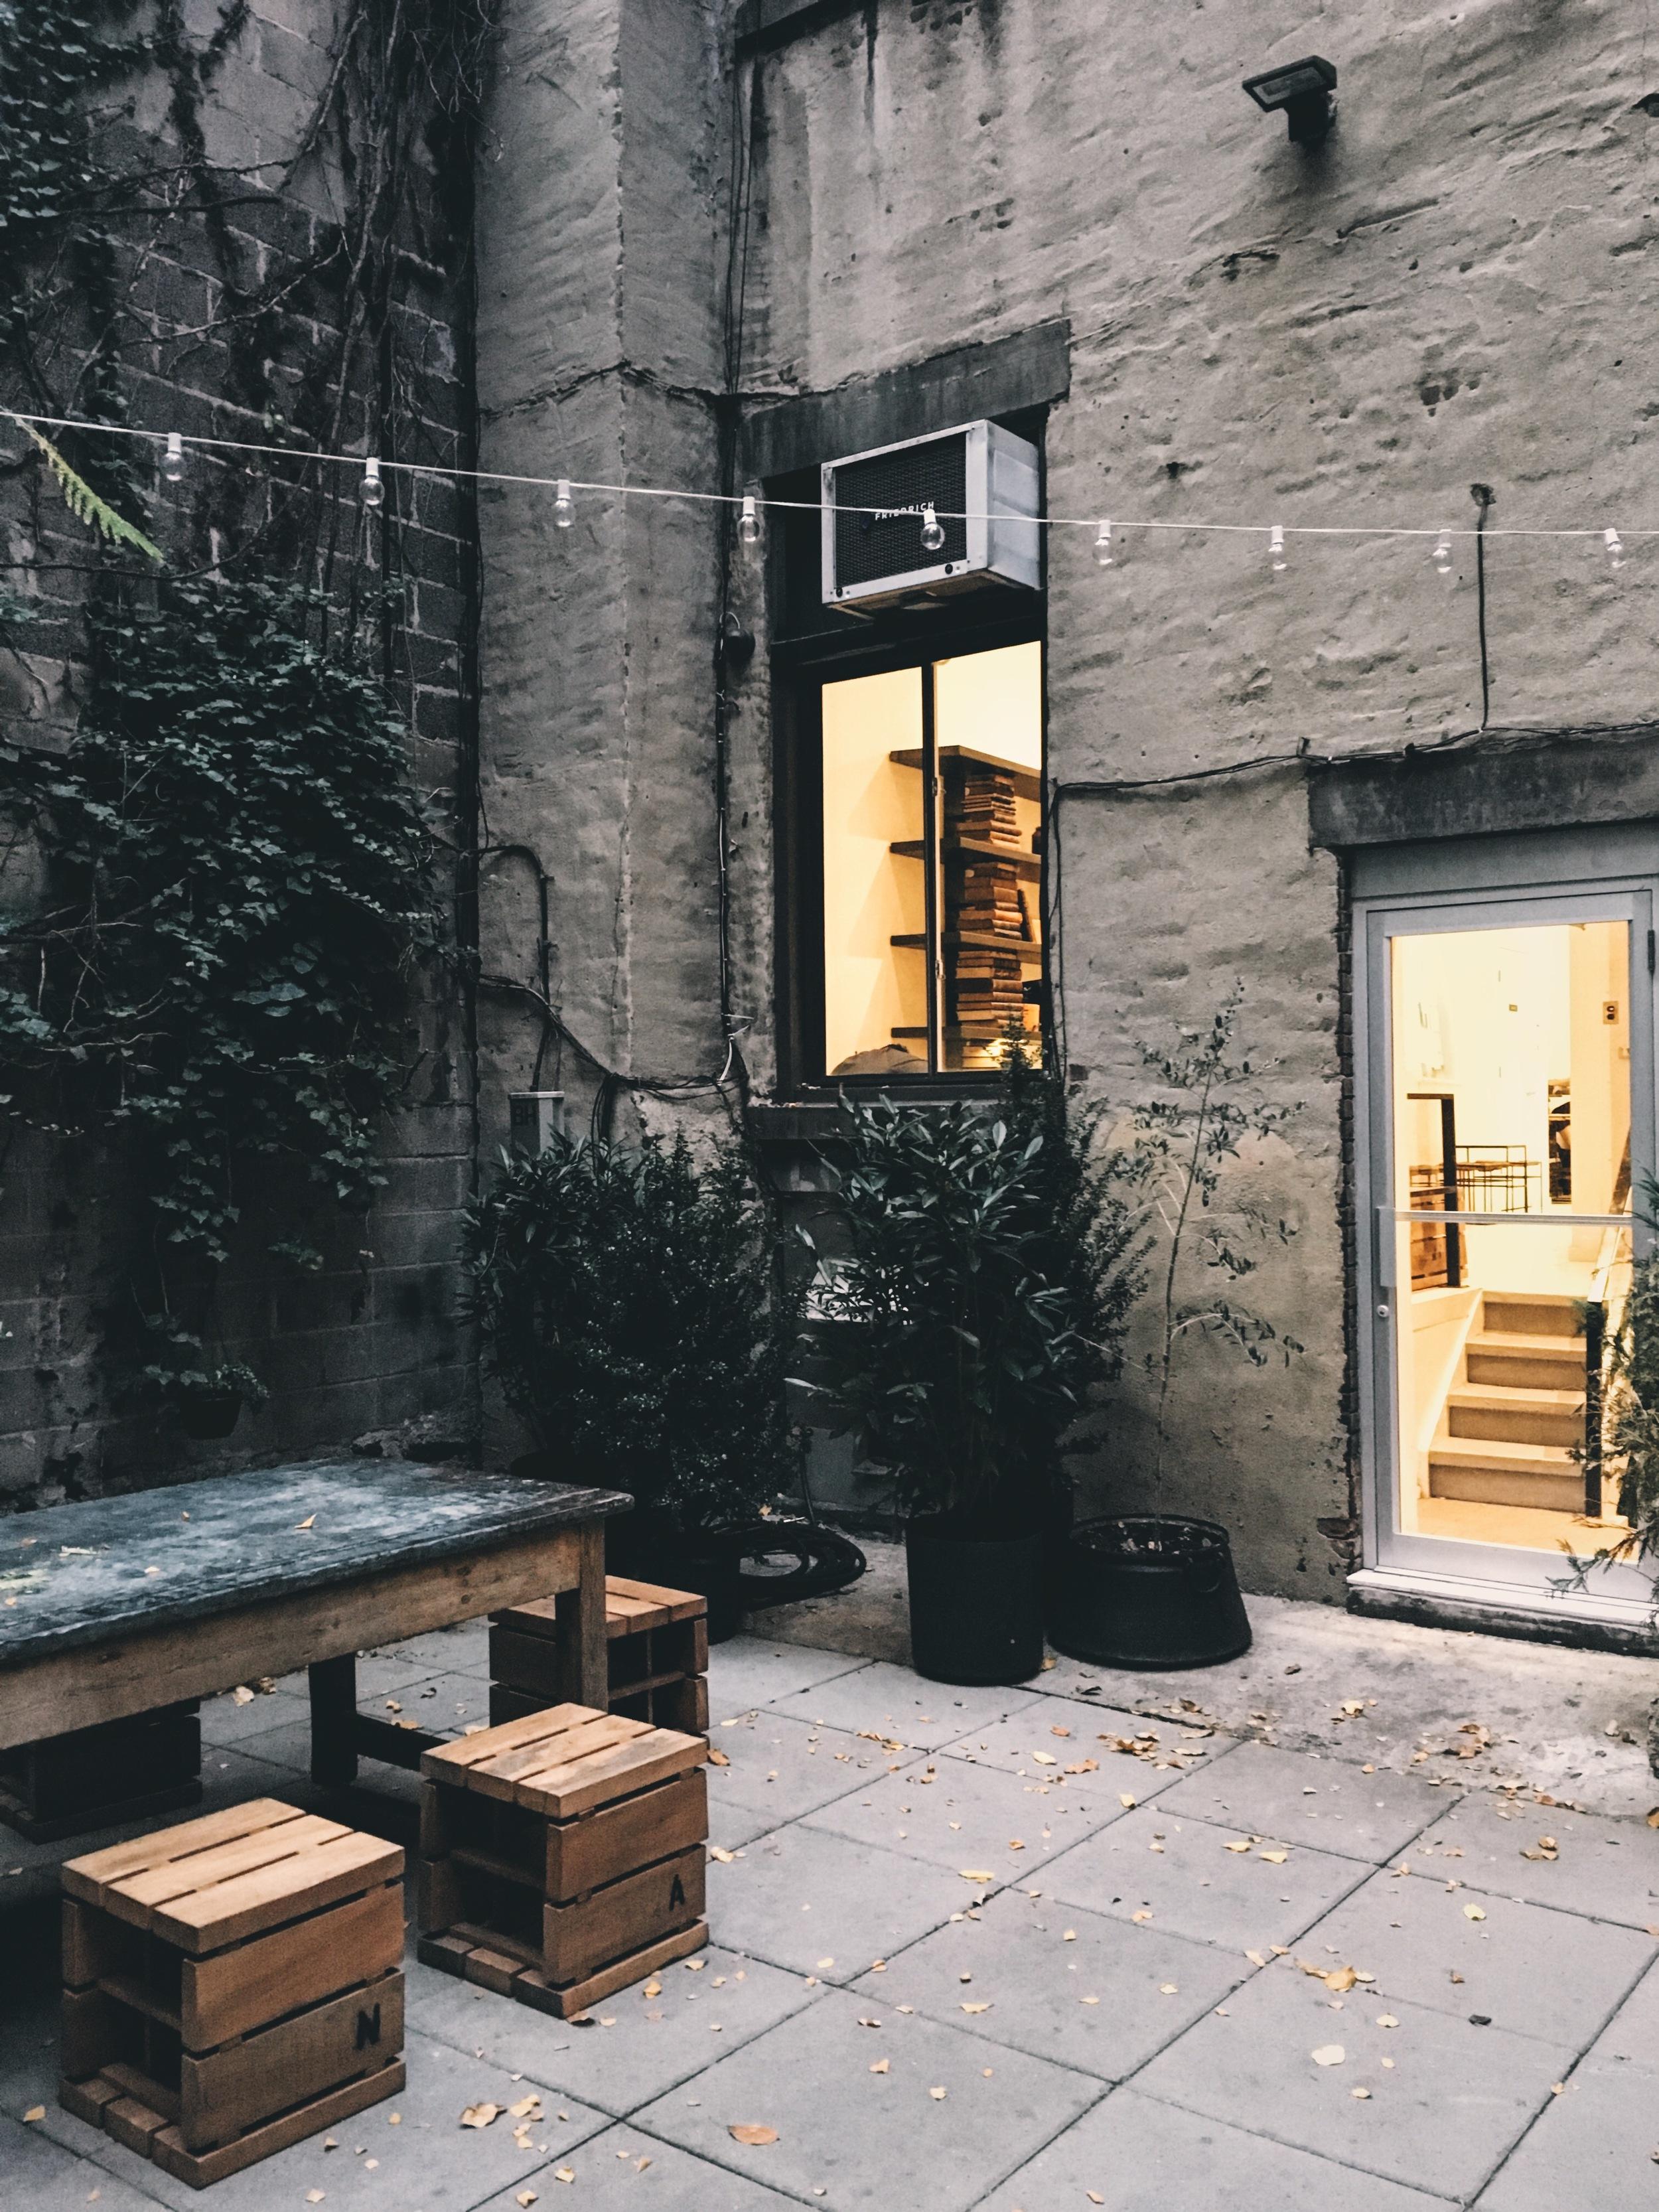 nyc_coffee_shop_outdoor_seating.jpg